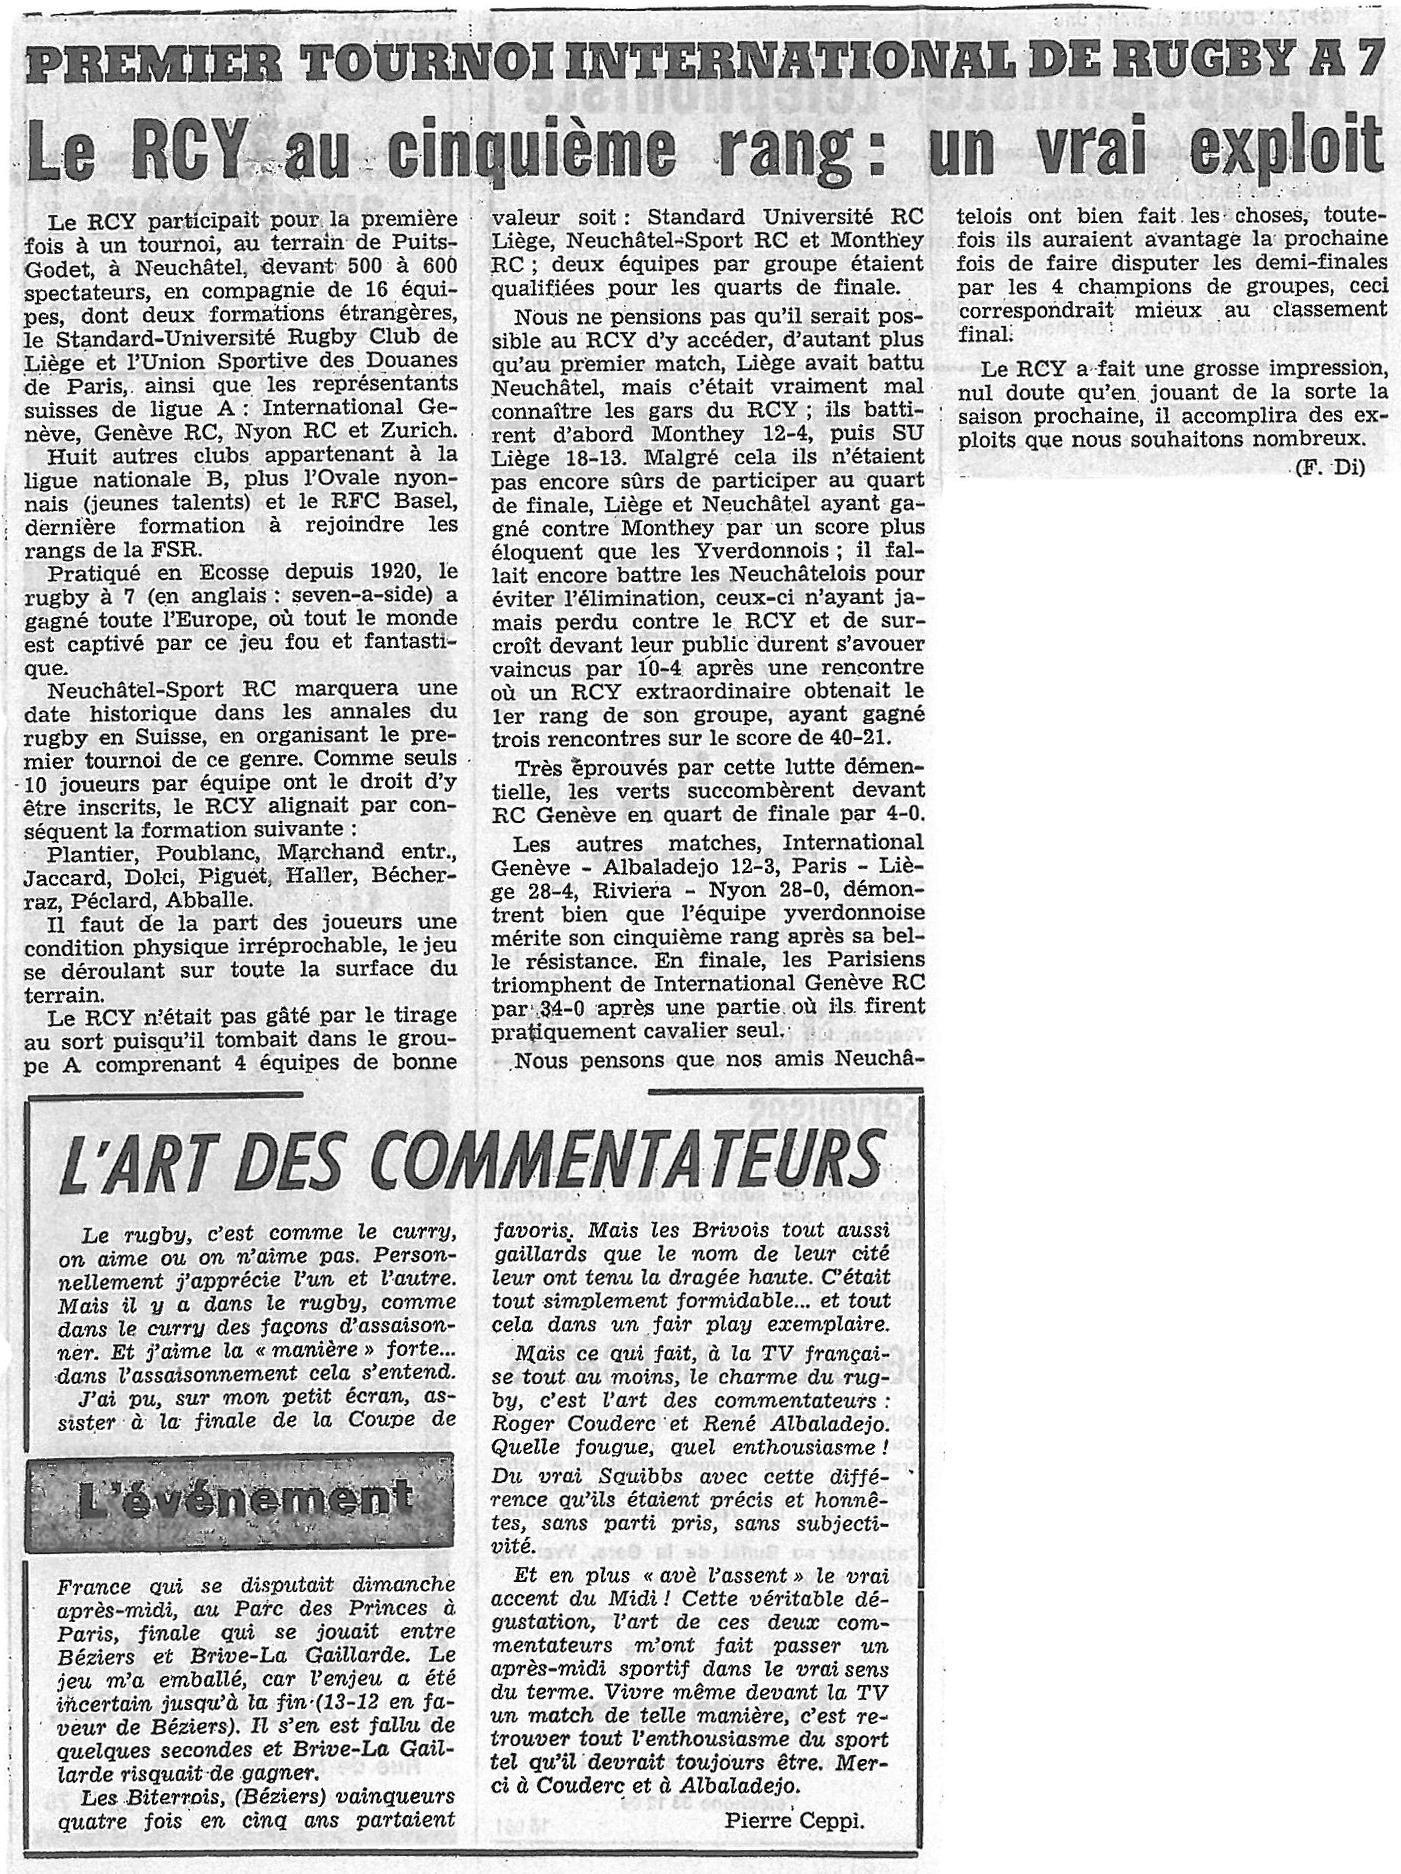 Mai 1975